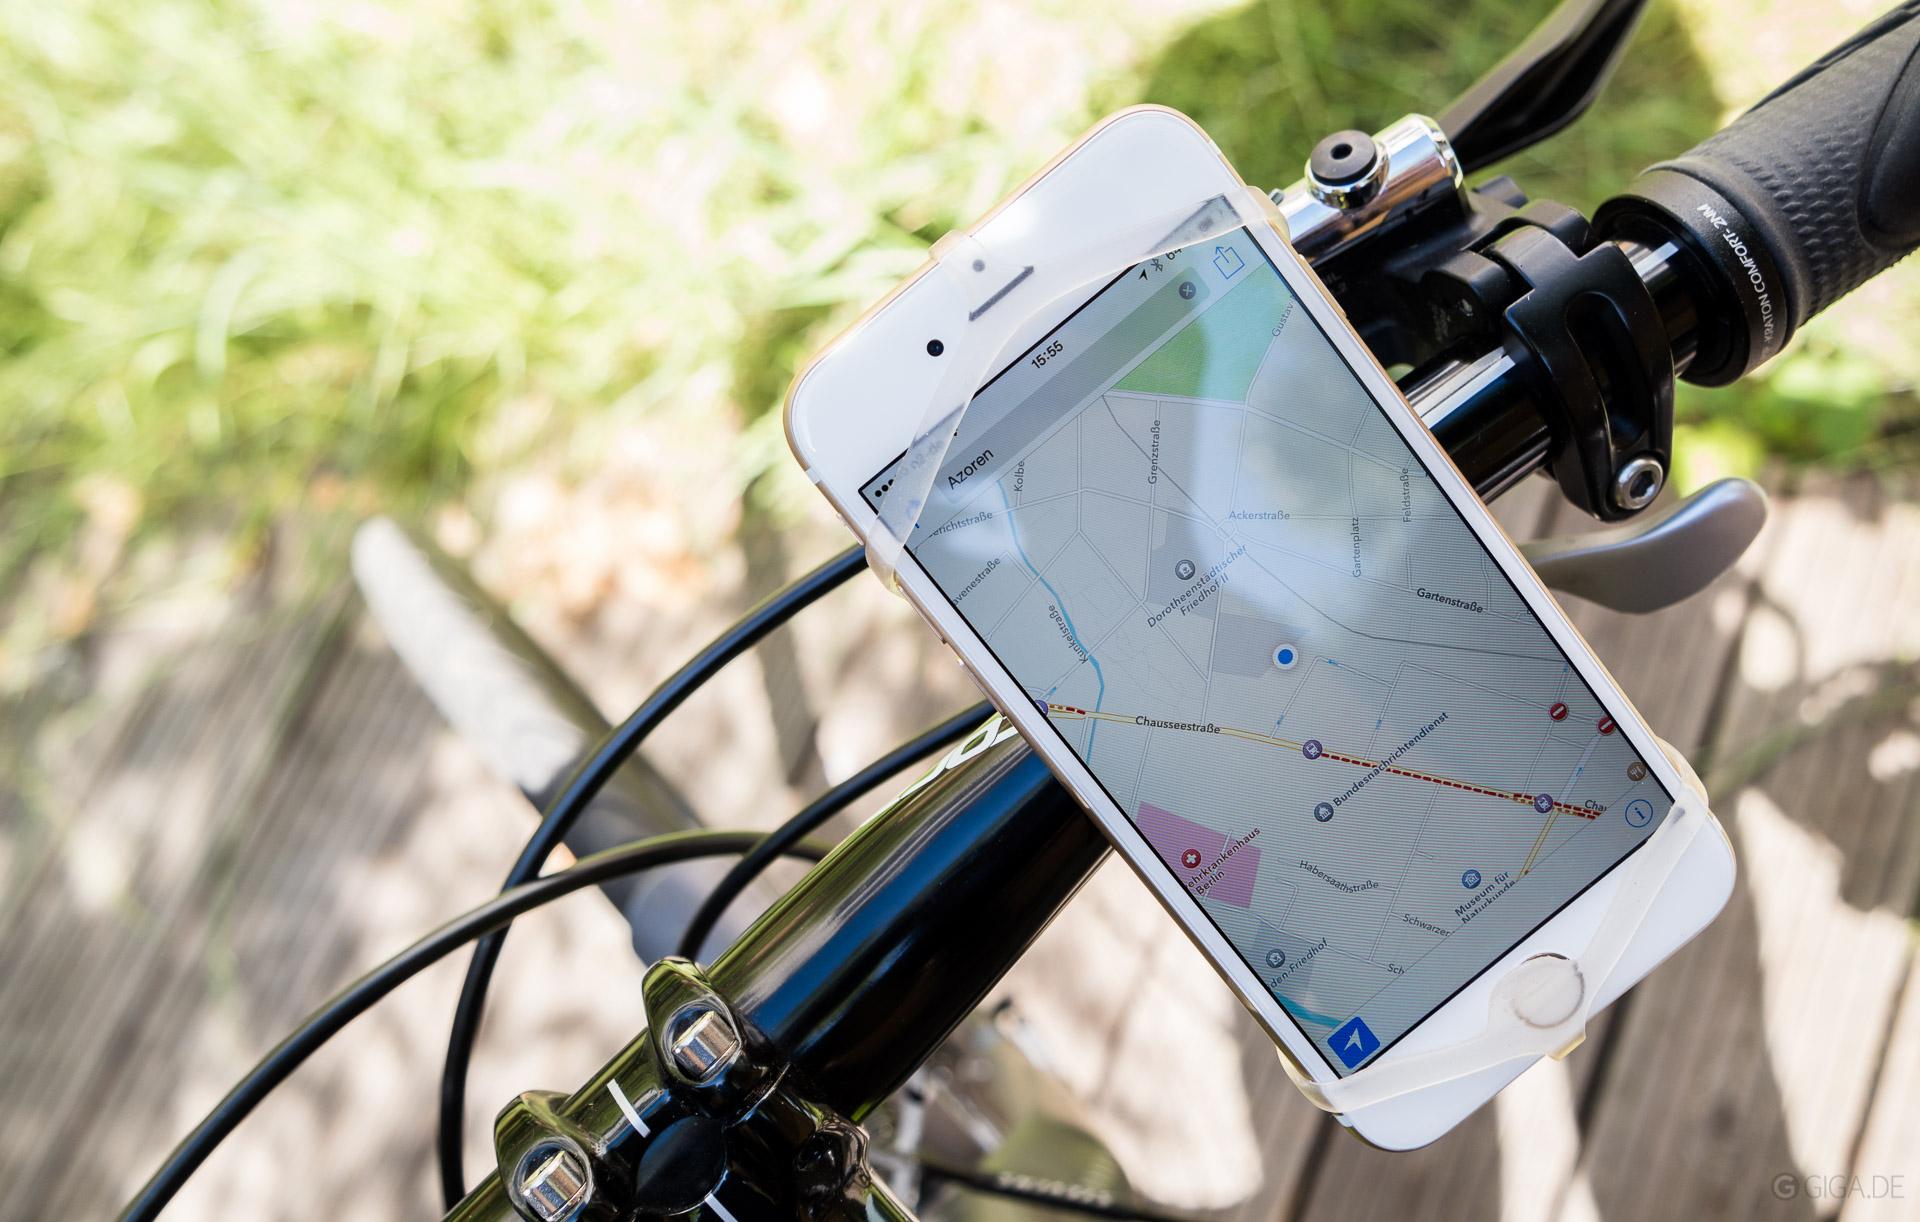 smartphone halterung finn f r das fahrrad im test silikon. Black Bedroom Furniture Sets. Home Design Ideas